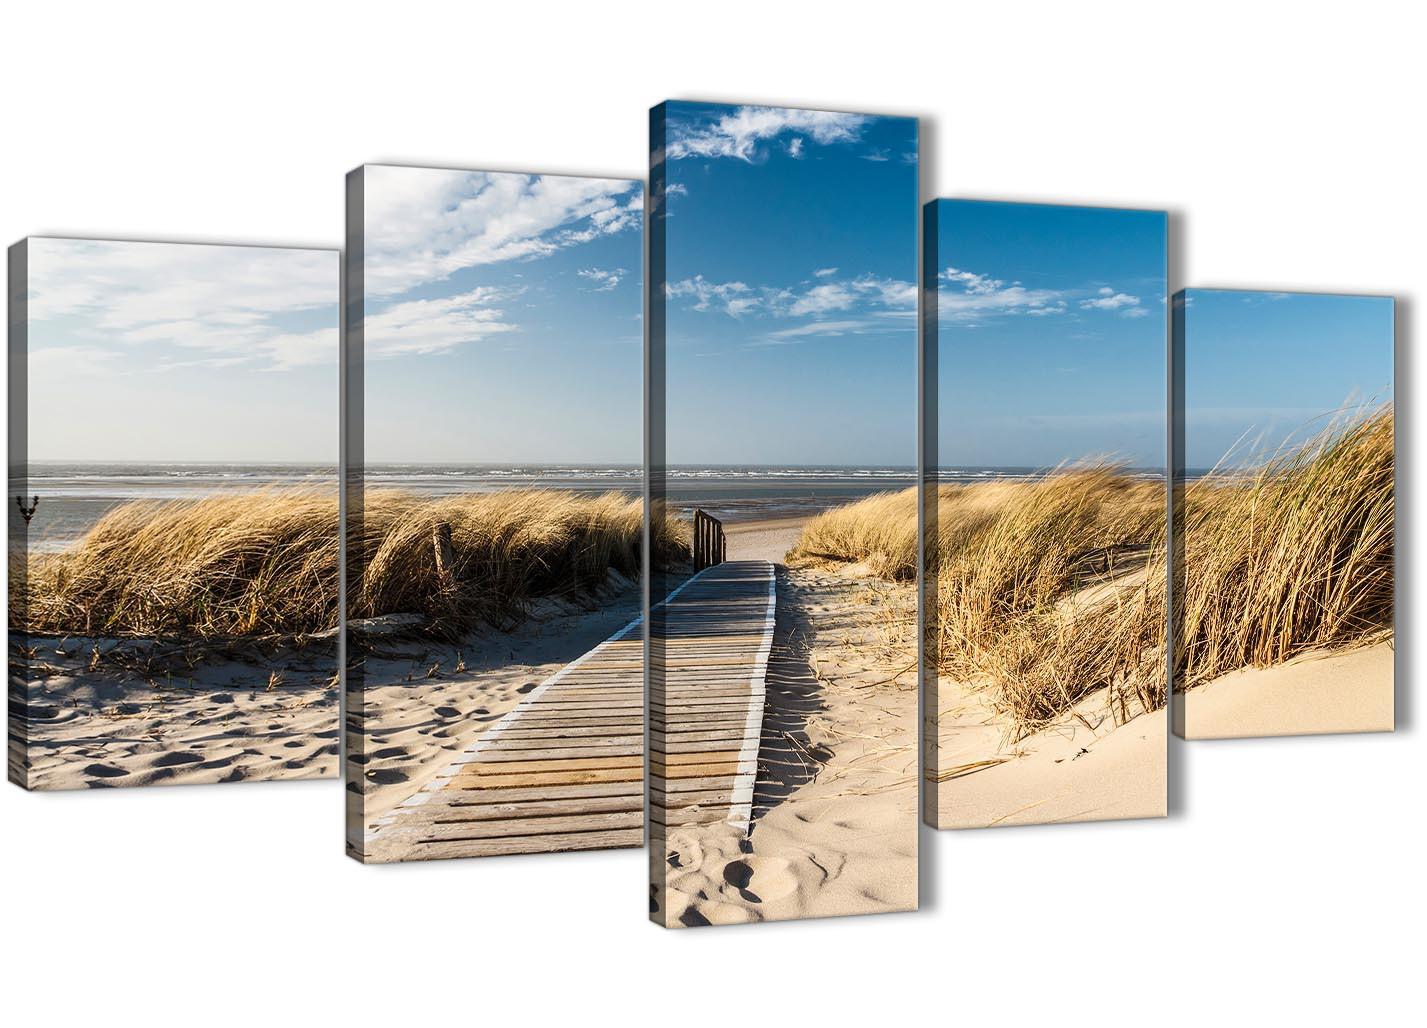 5 Piece Beach Landscape Canvas Wall Art Pictures Pathway